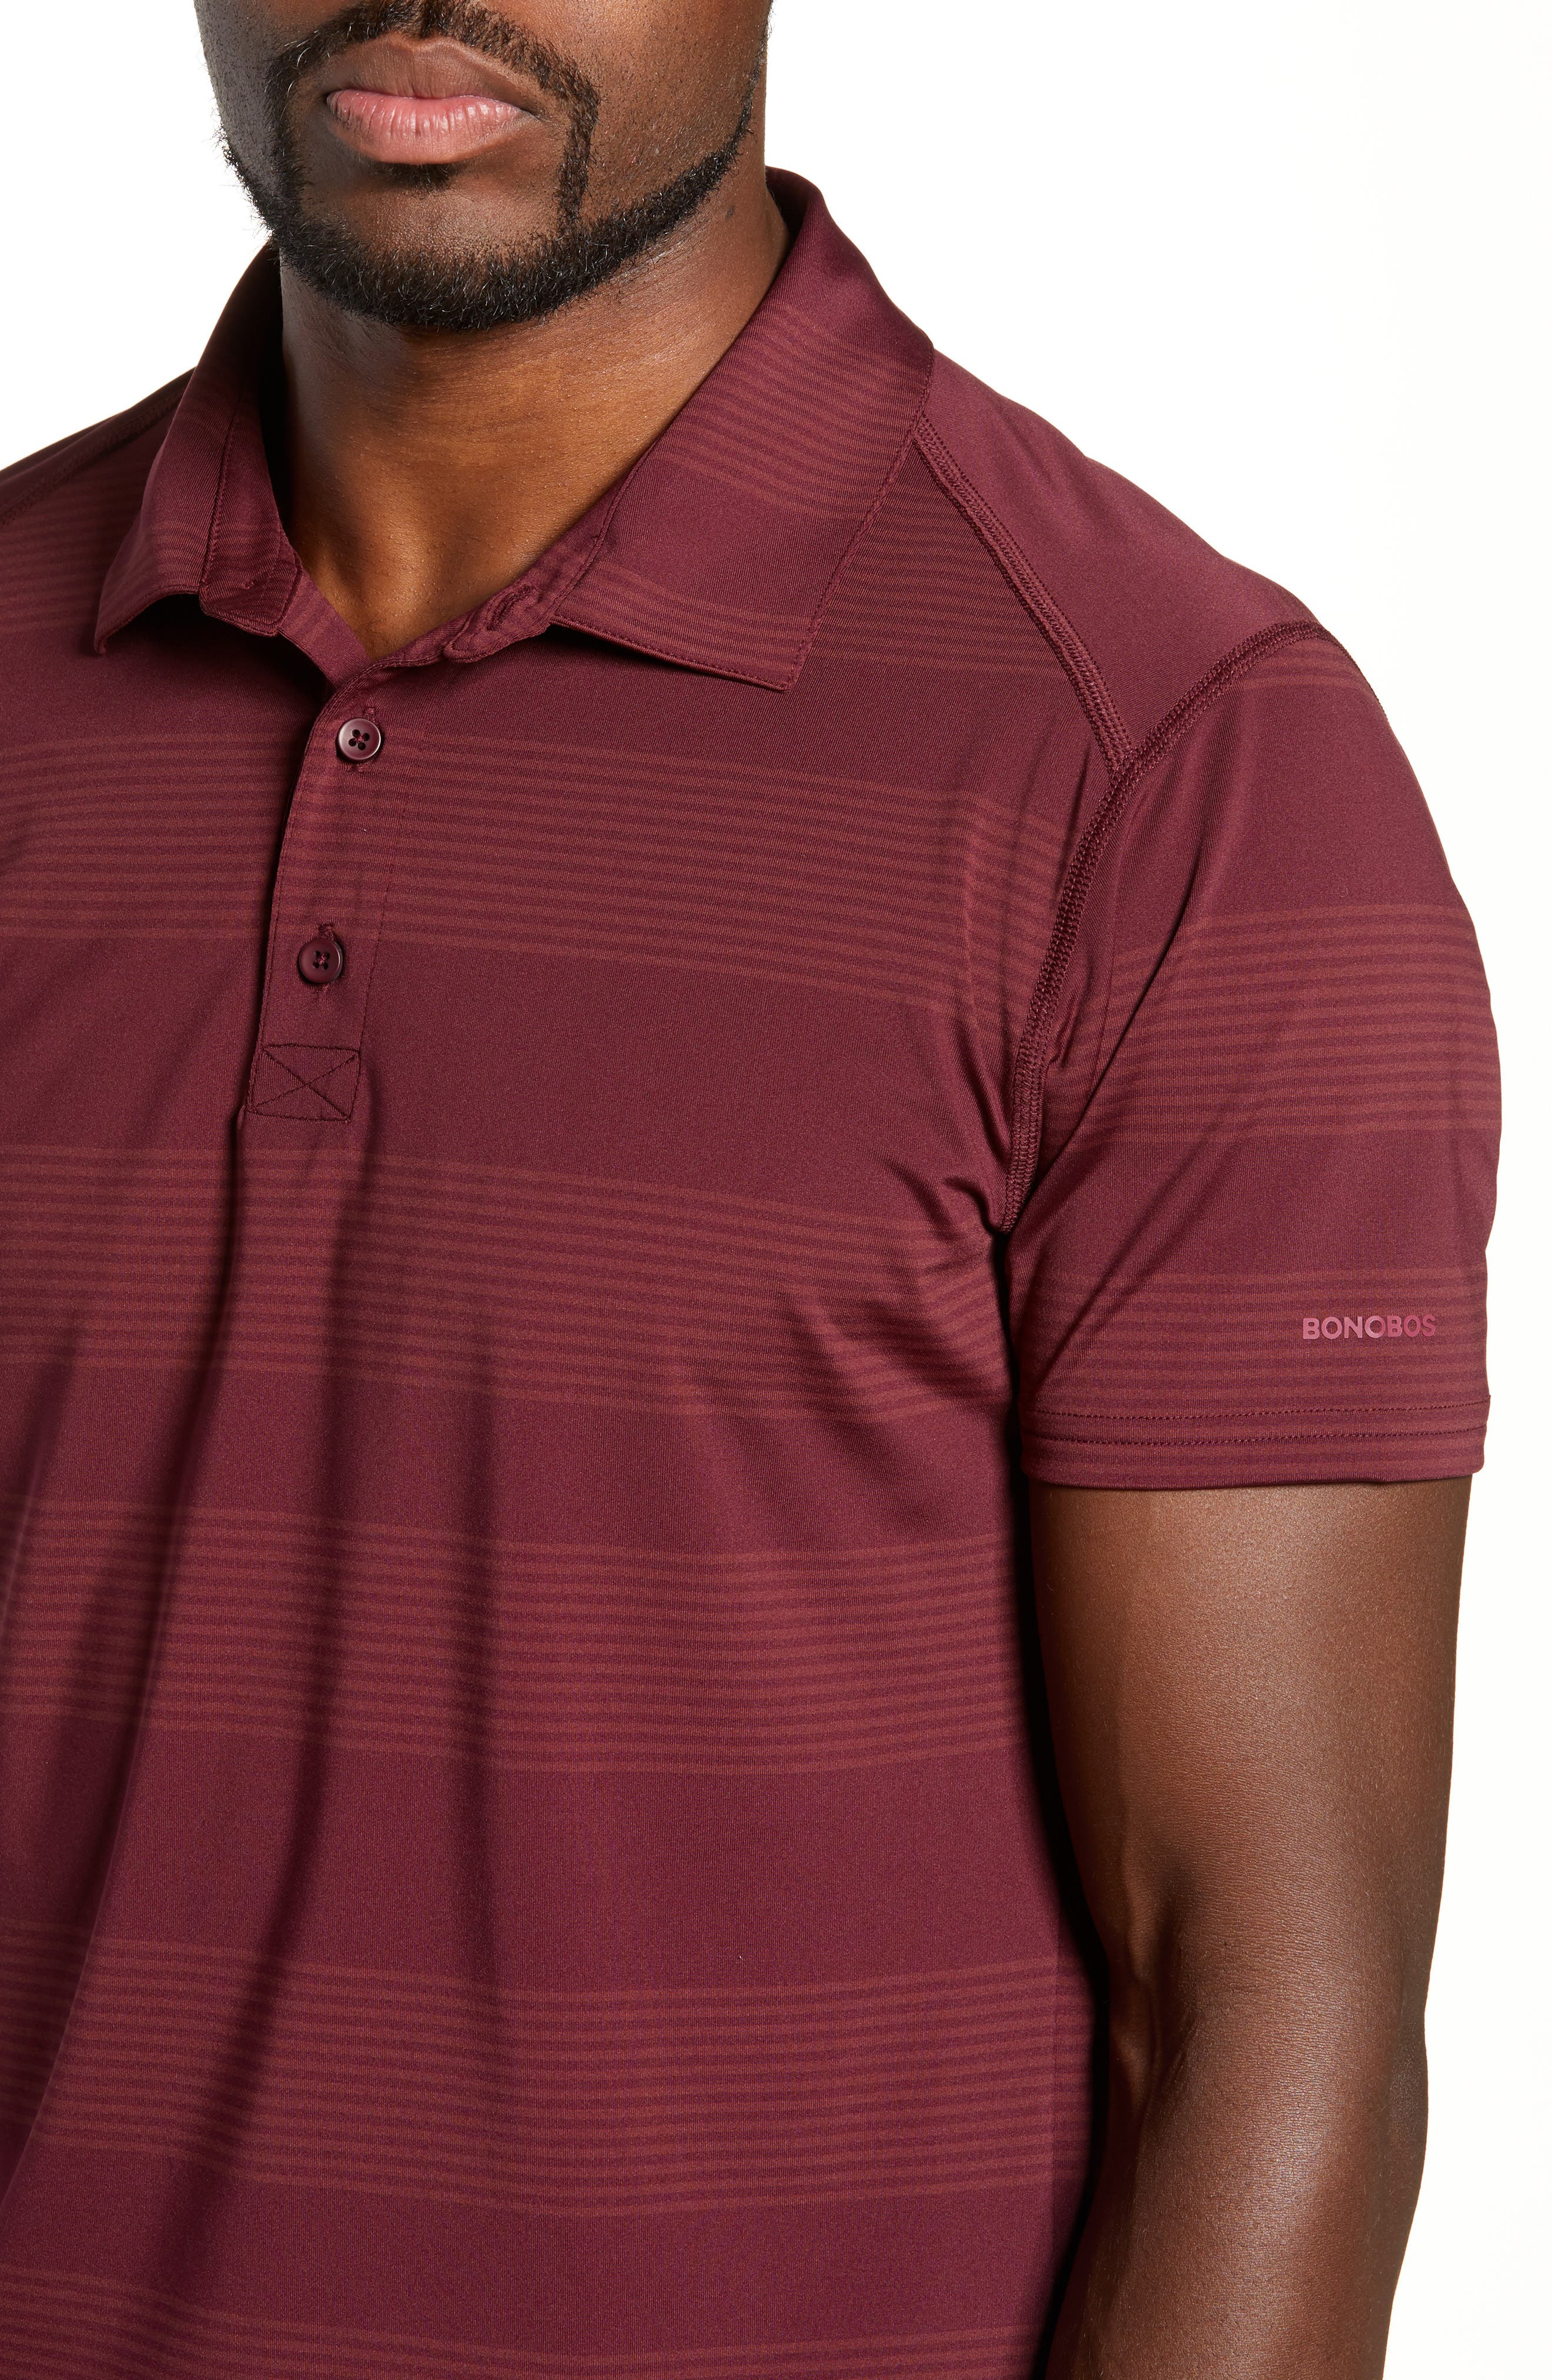 BONOBOS,                             Flatiron Slim Fit Stripe Golf Polo,                             Alternate thumbnail 4, color,                             600